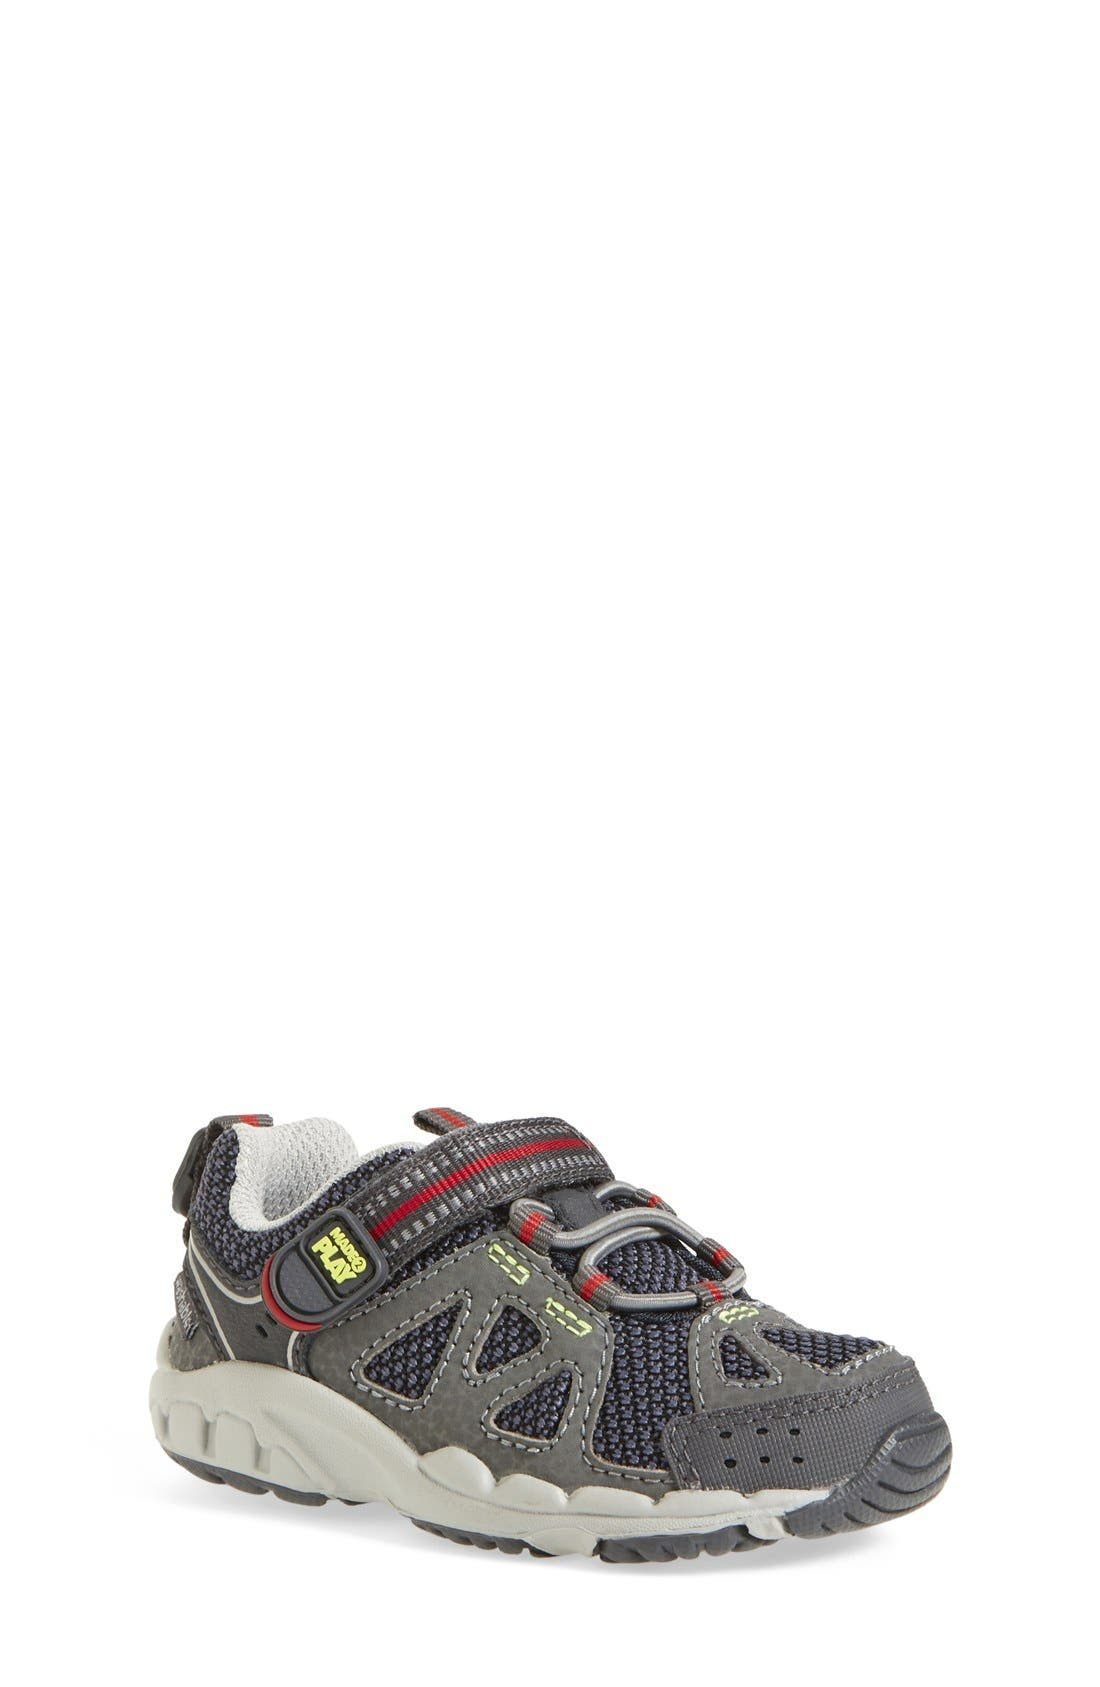 Main Image - Stride Rite 'Made 2 Play® Ian' Sneaker (Baby, Walker & Toddler)